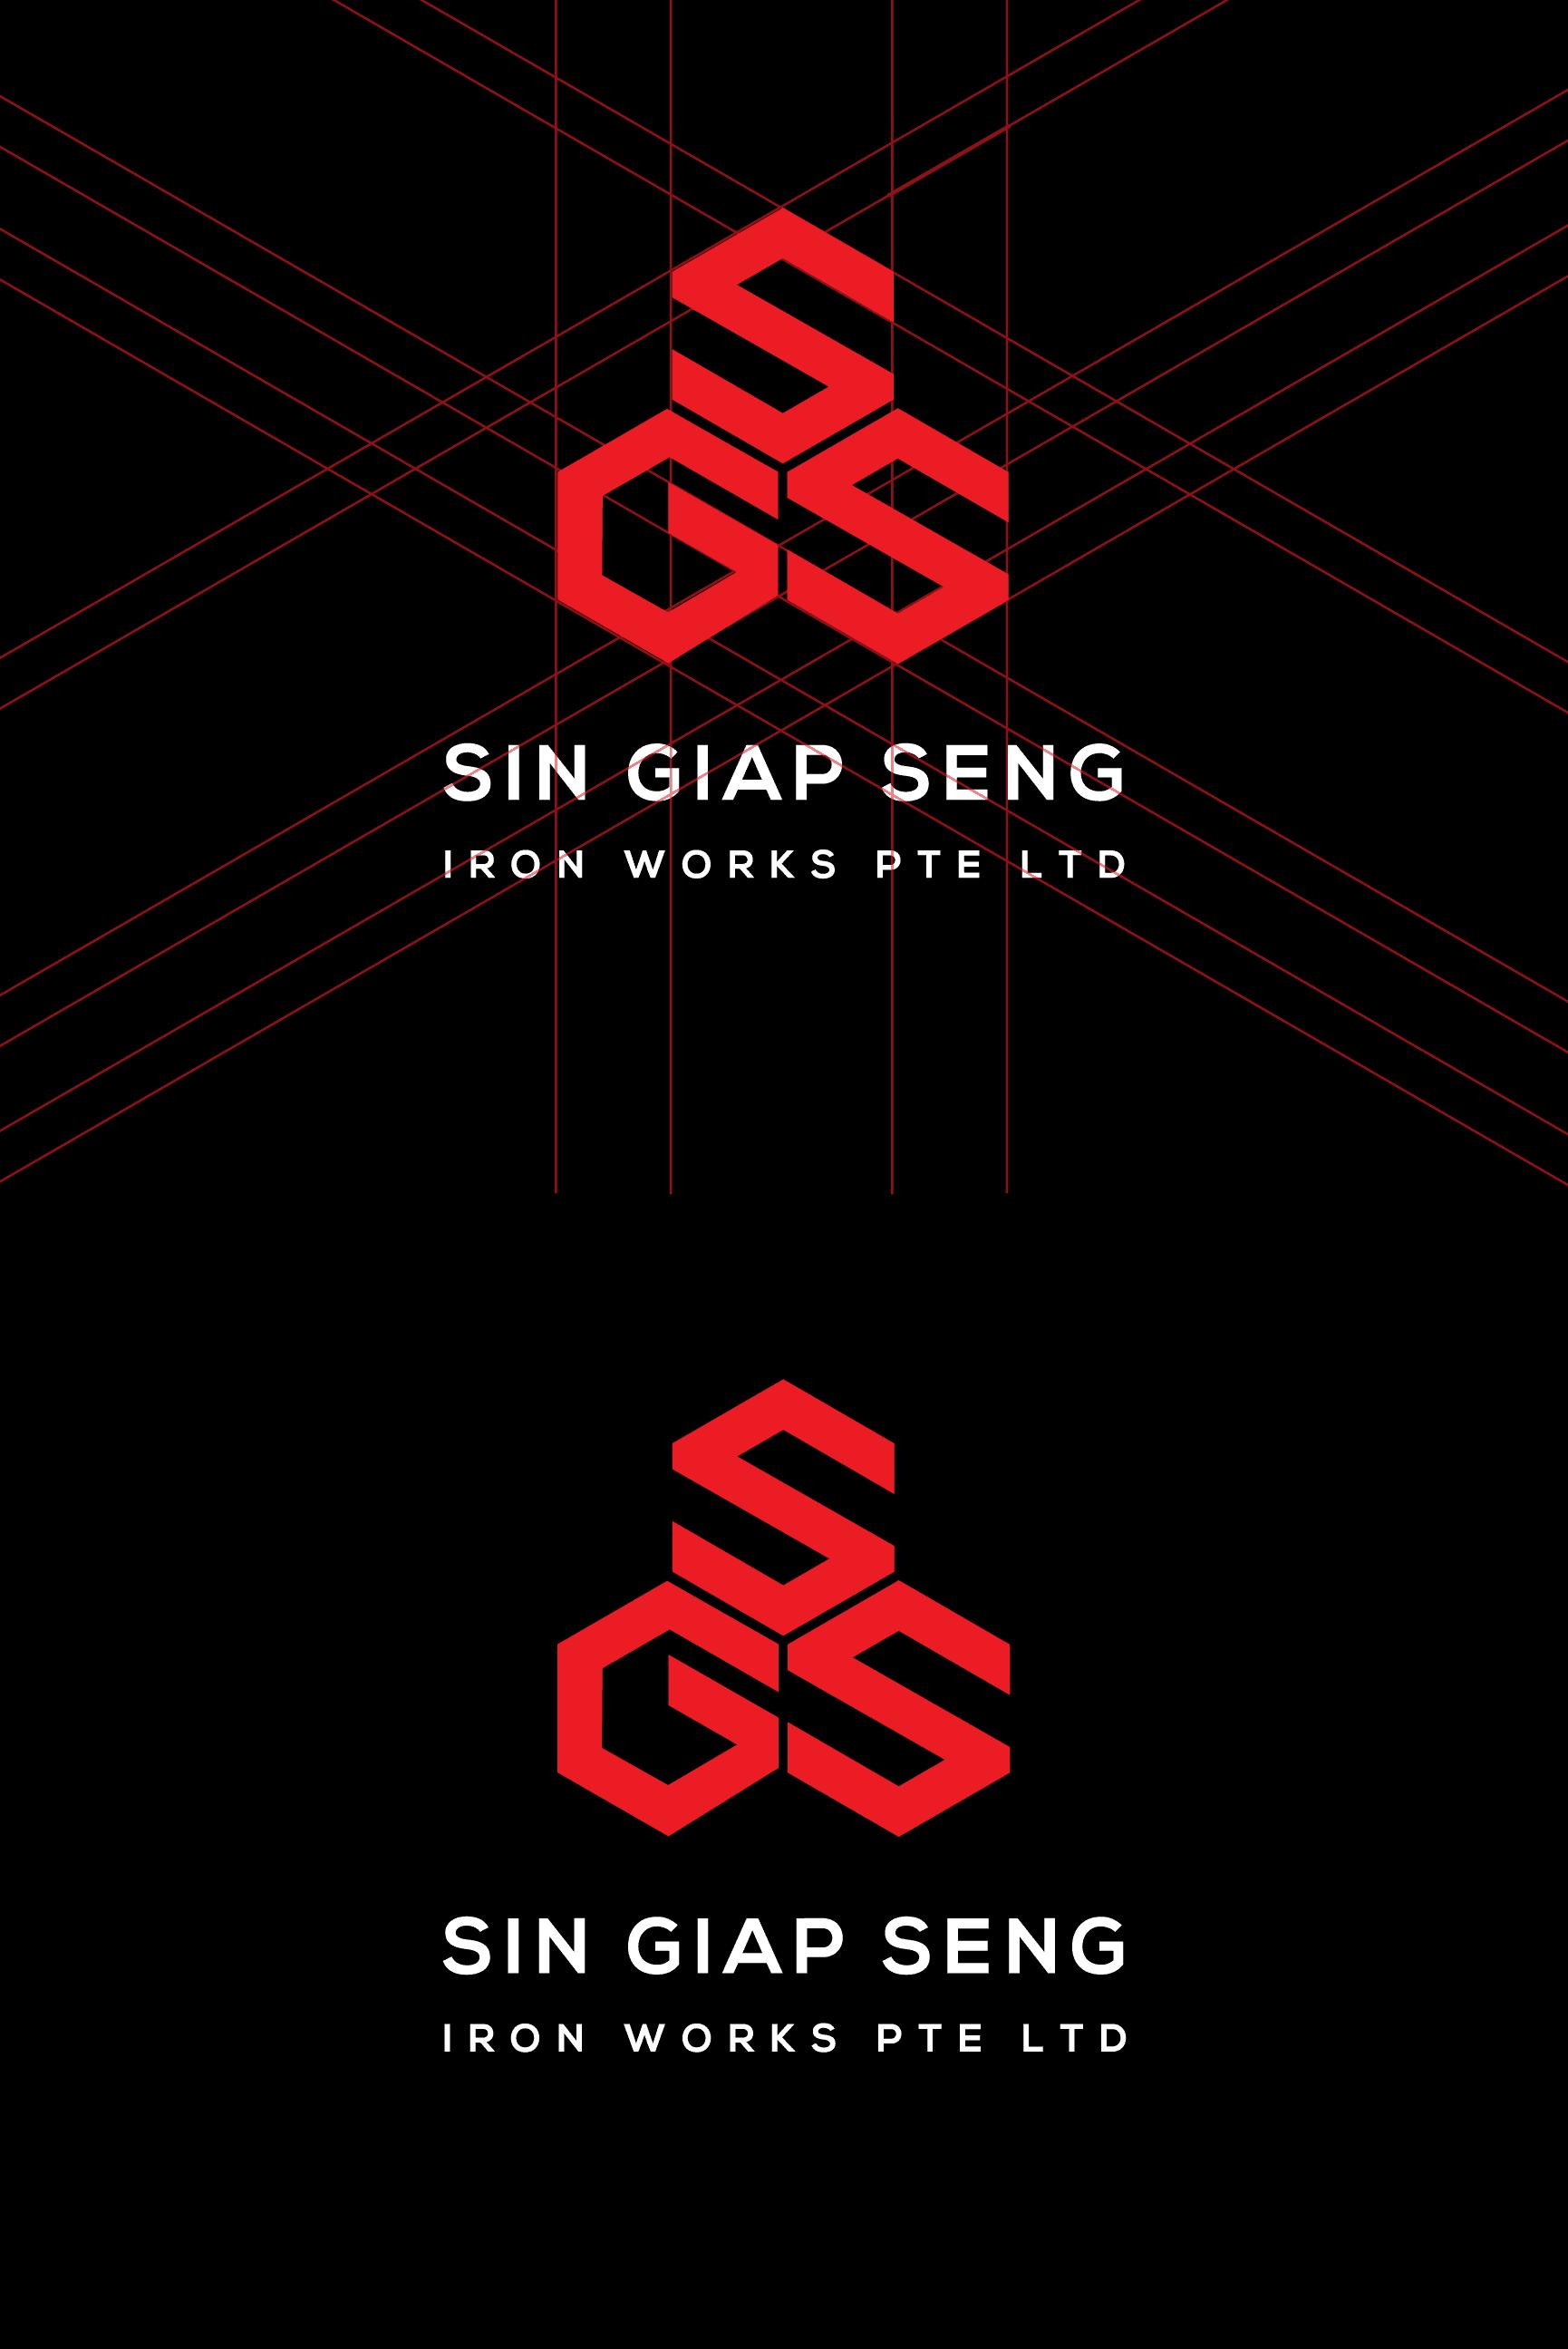 SGS brand logo